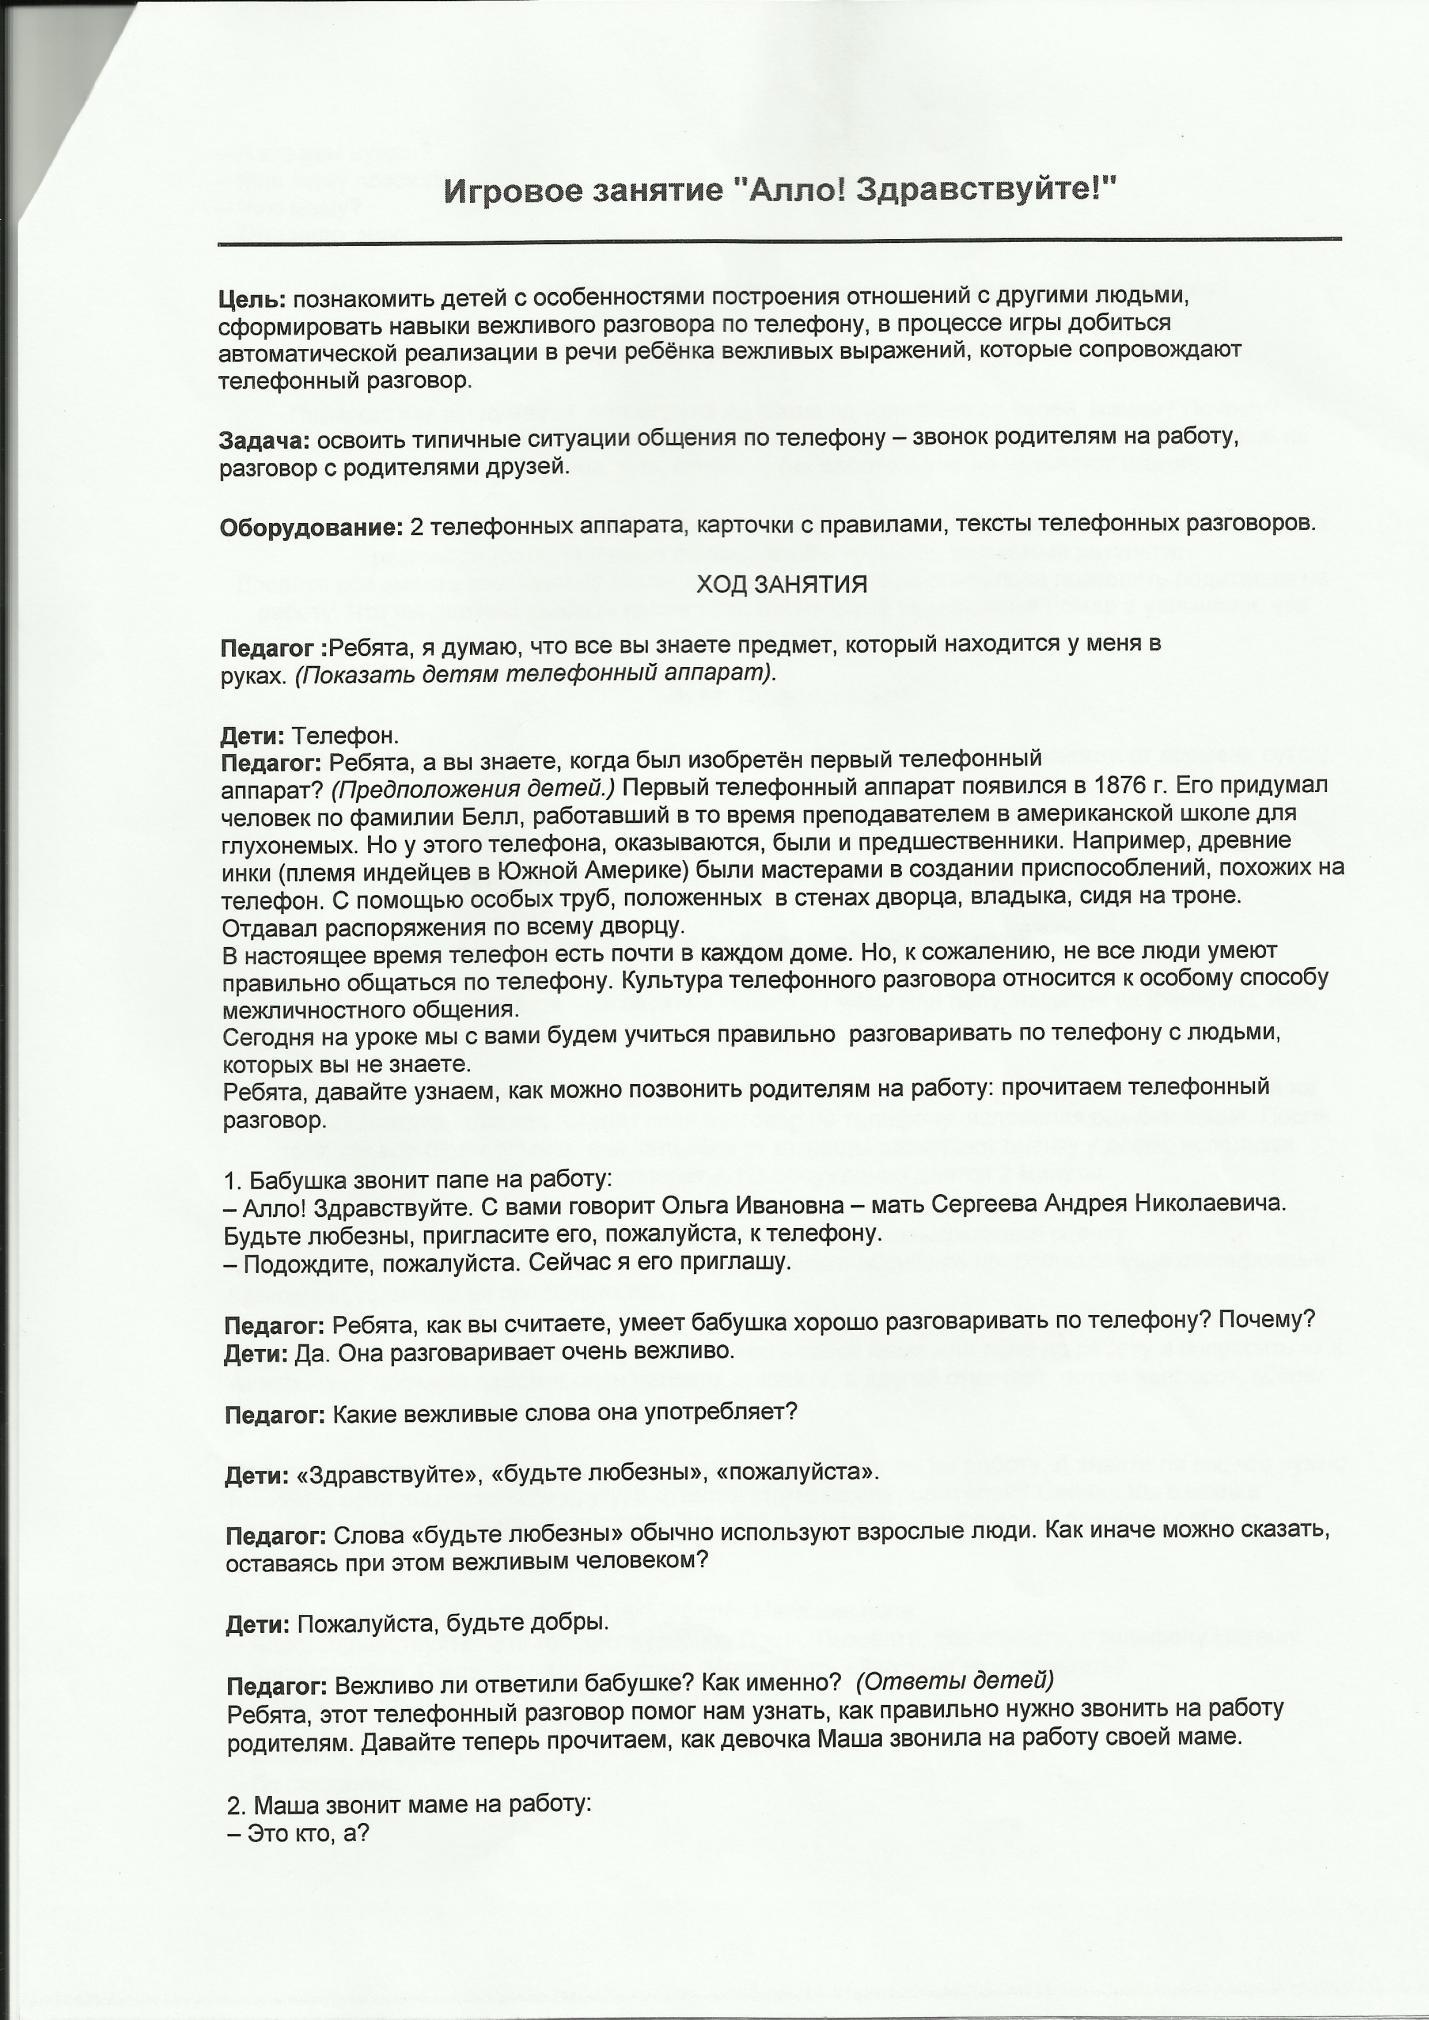 C:\Documents and Settings\User\Рабочий стол\мама\скан\Scan2.tif